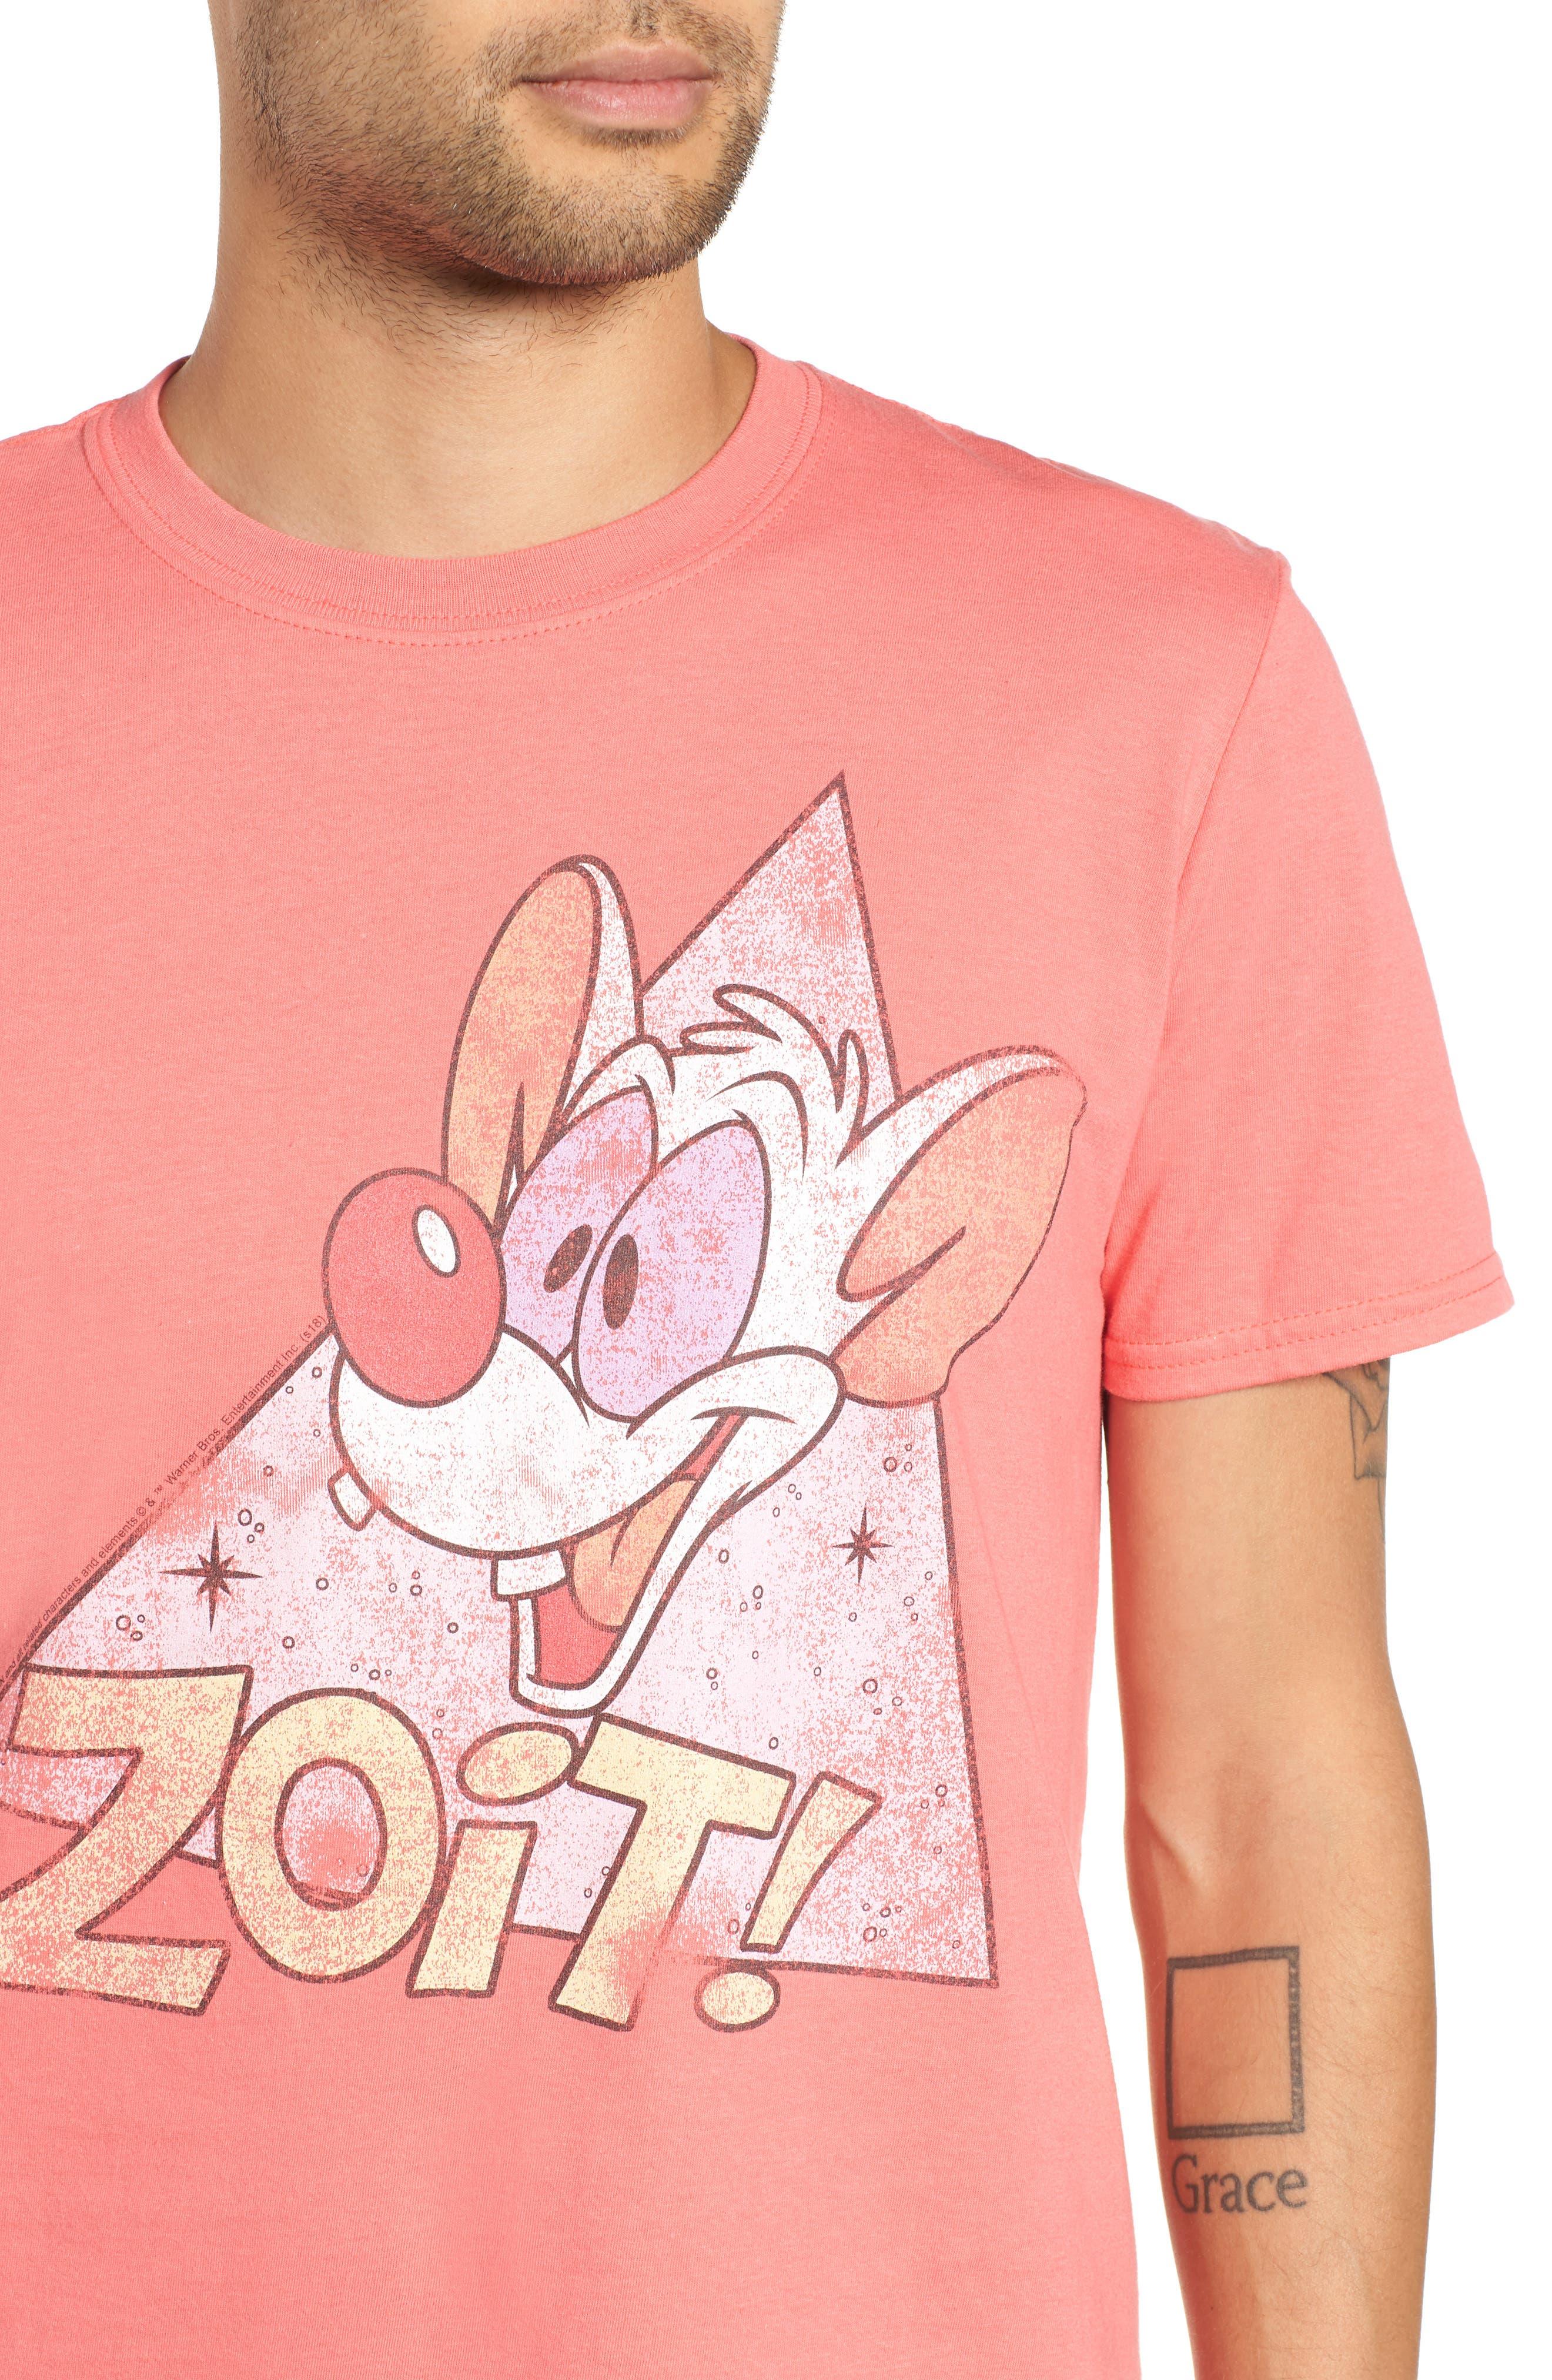 Zoit Graphic T-Shirt,                             Alternate thumbnail 4, color,                             CORAL ZOIT